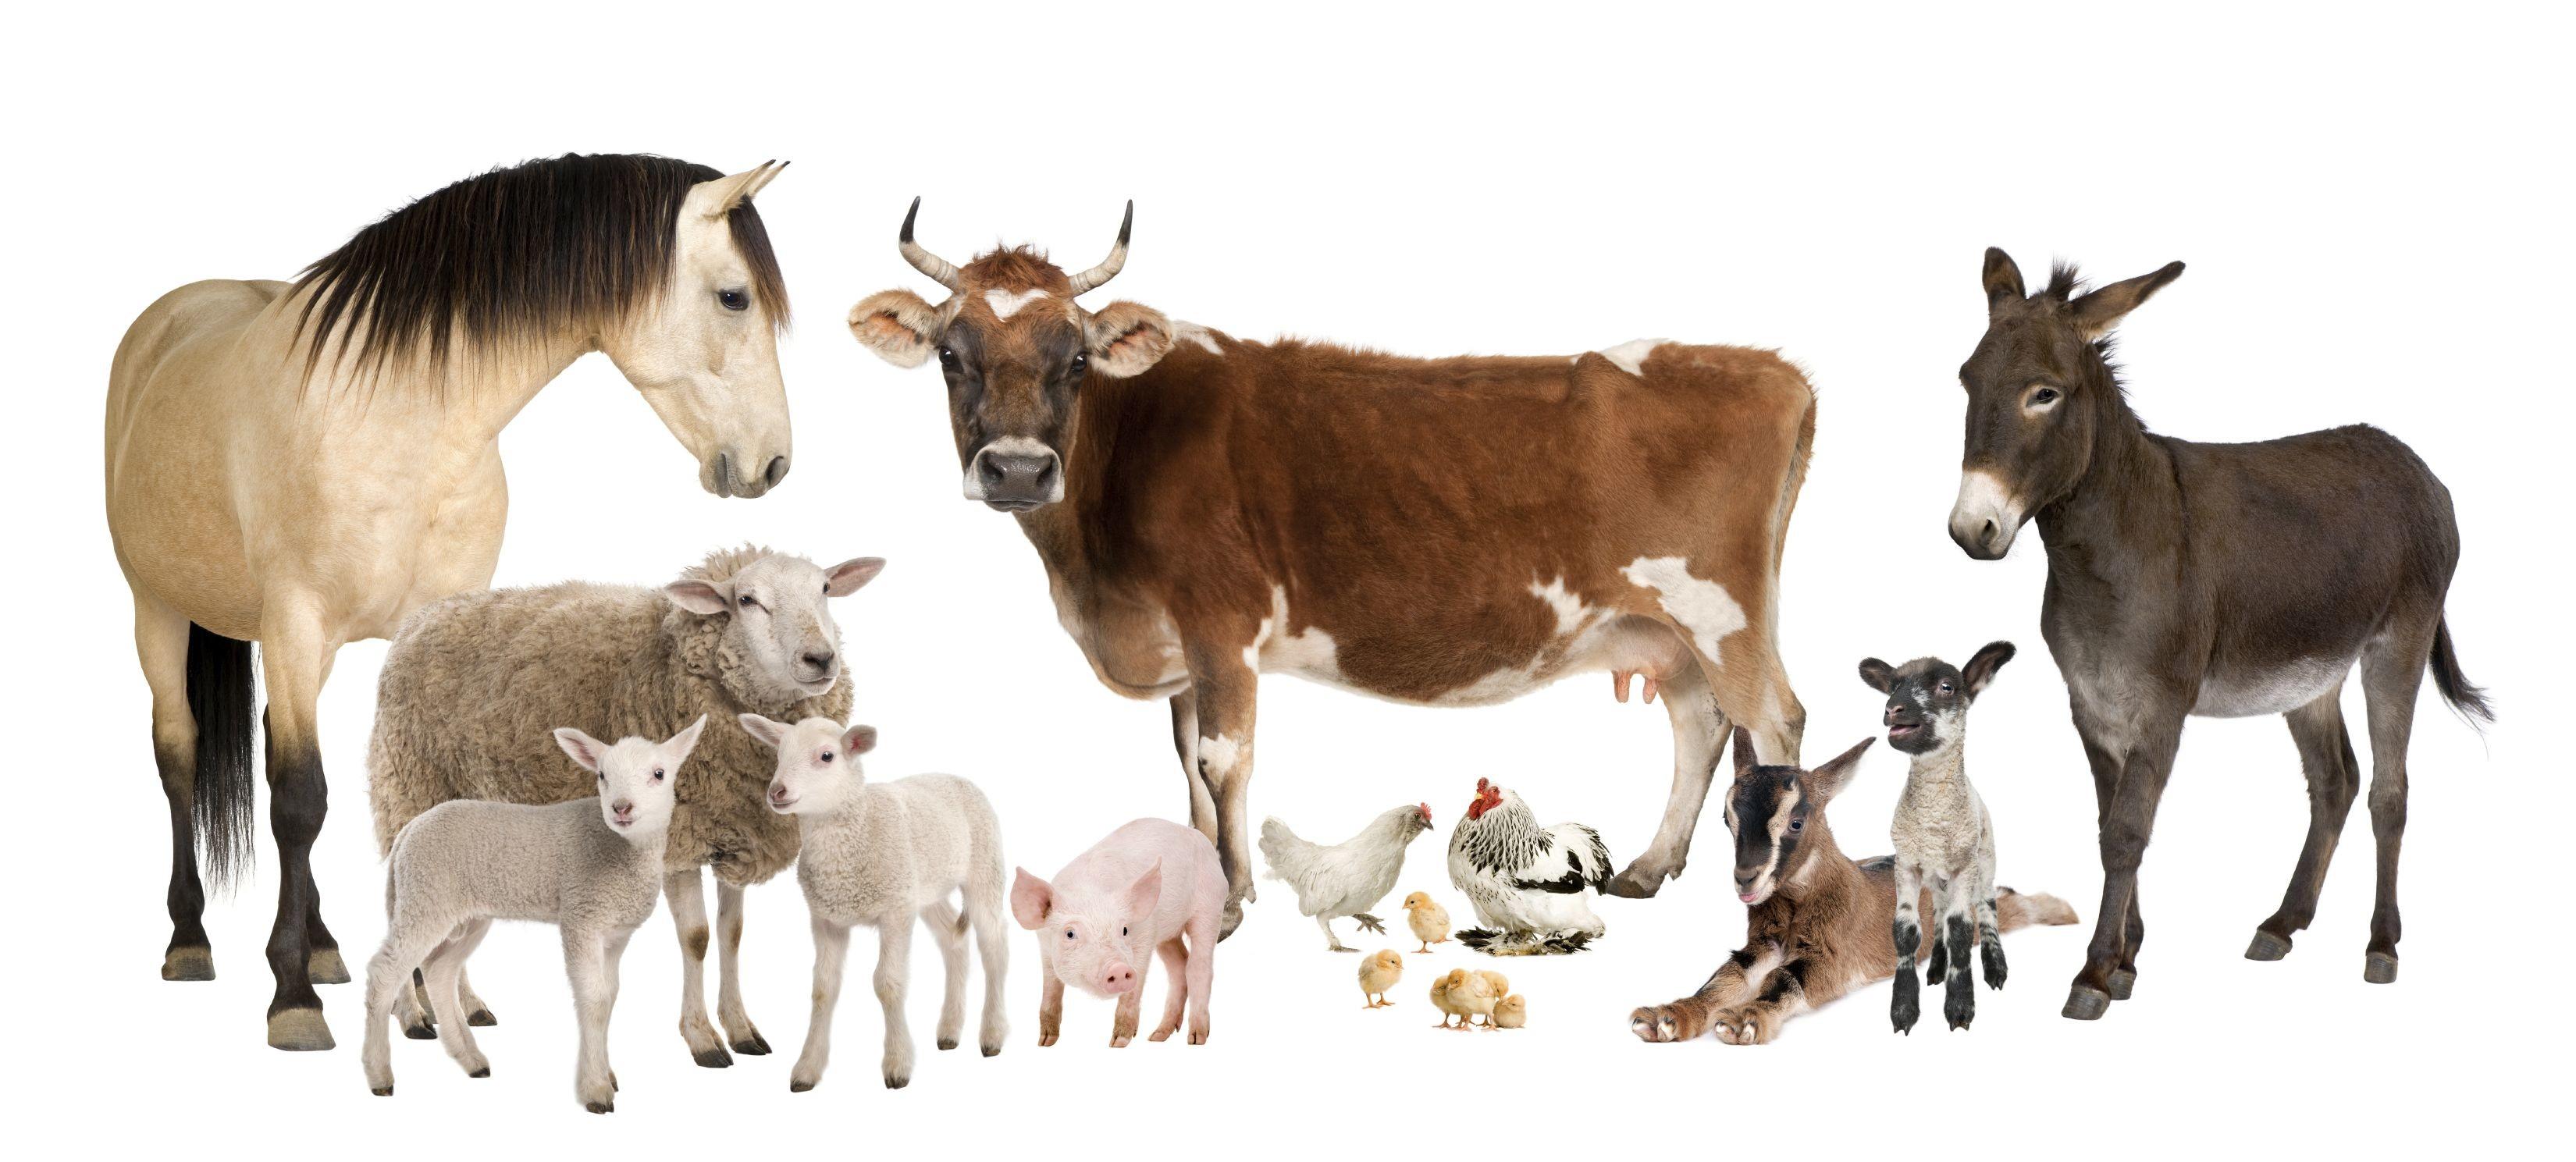 Farm Animals Wallpaper ·①